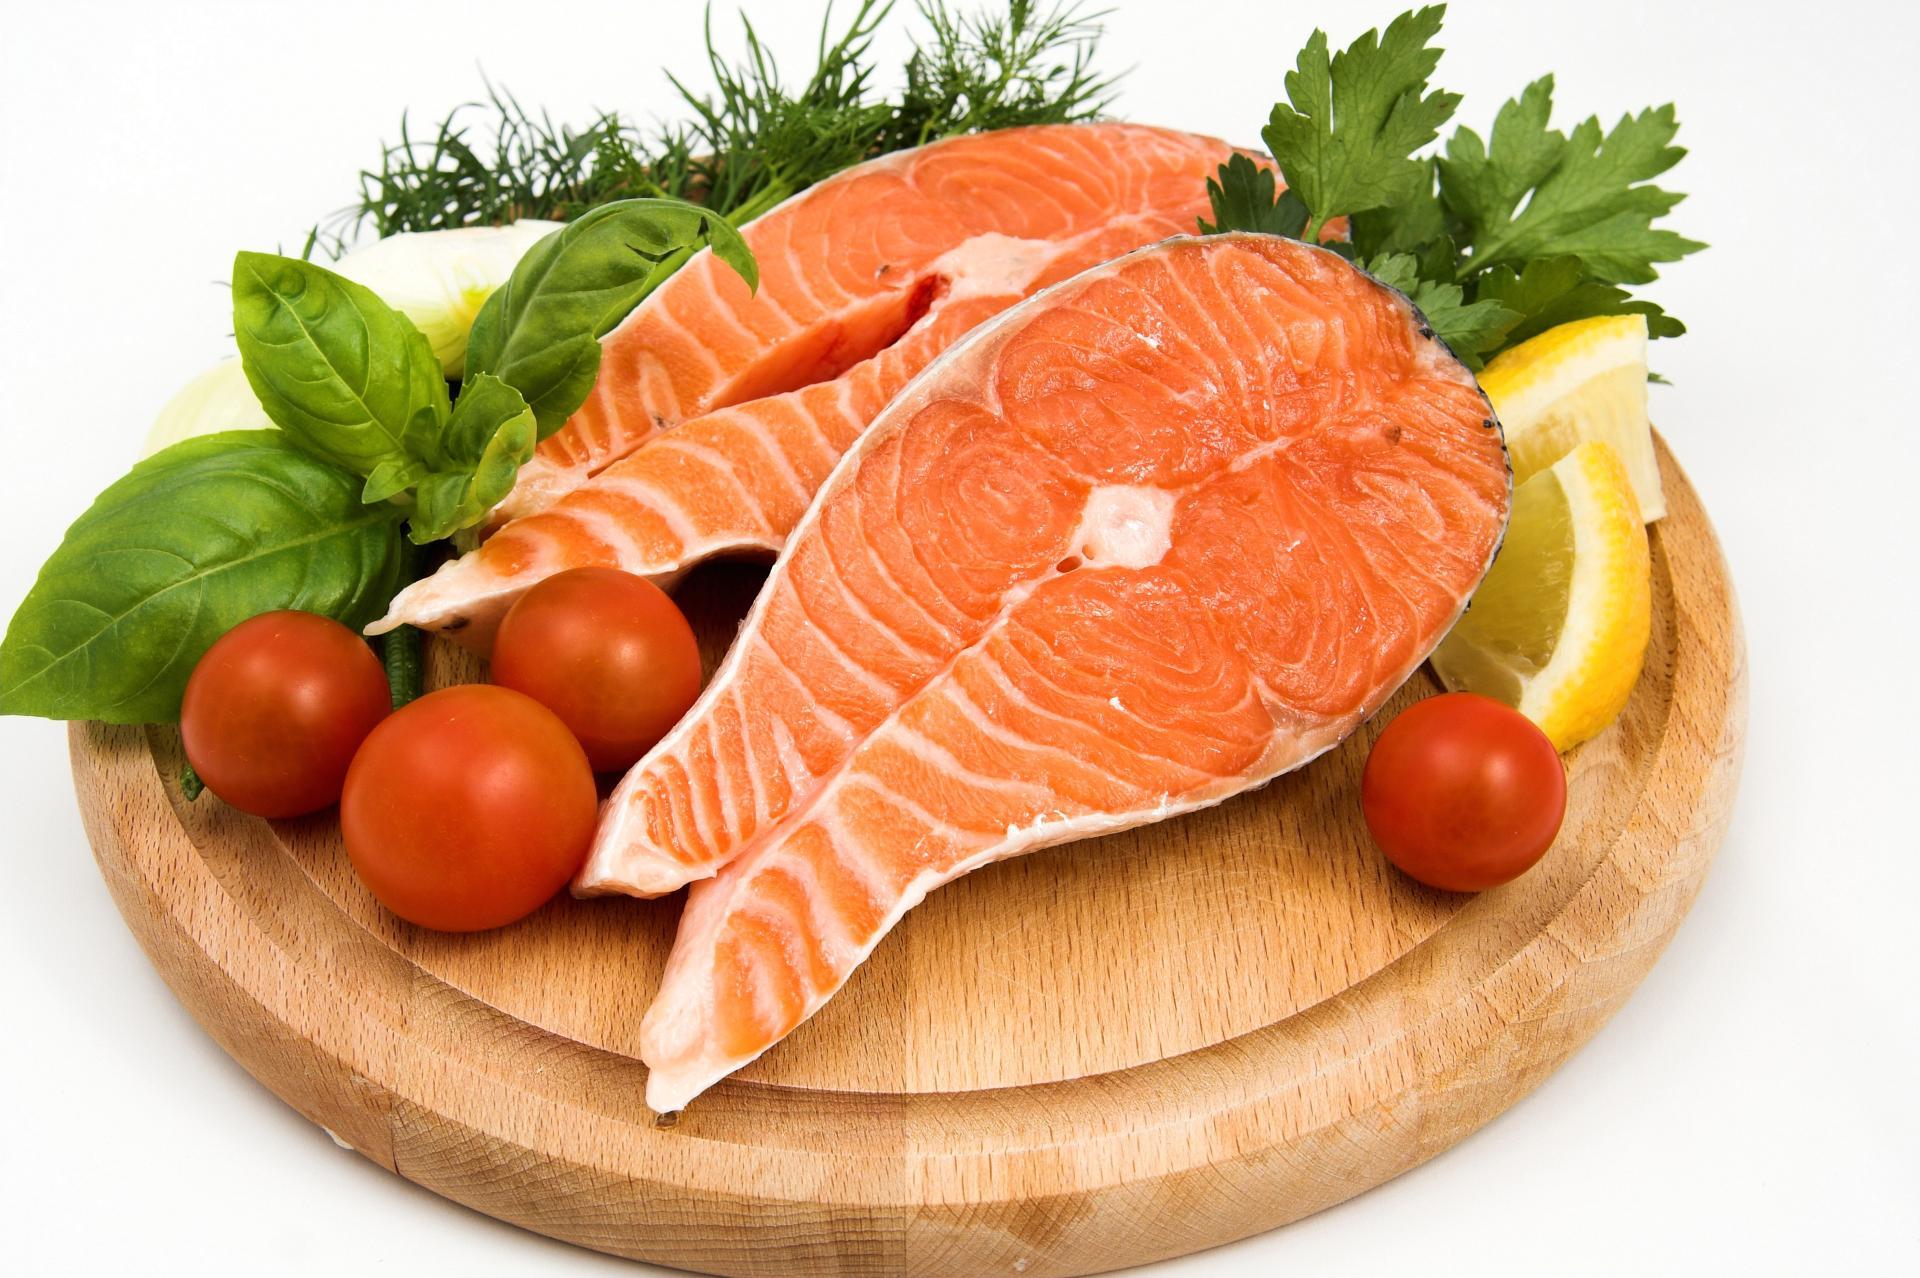 wallpaper-amazing-salmon-fish